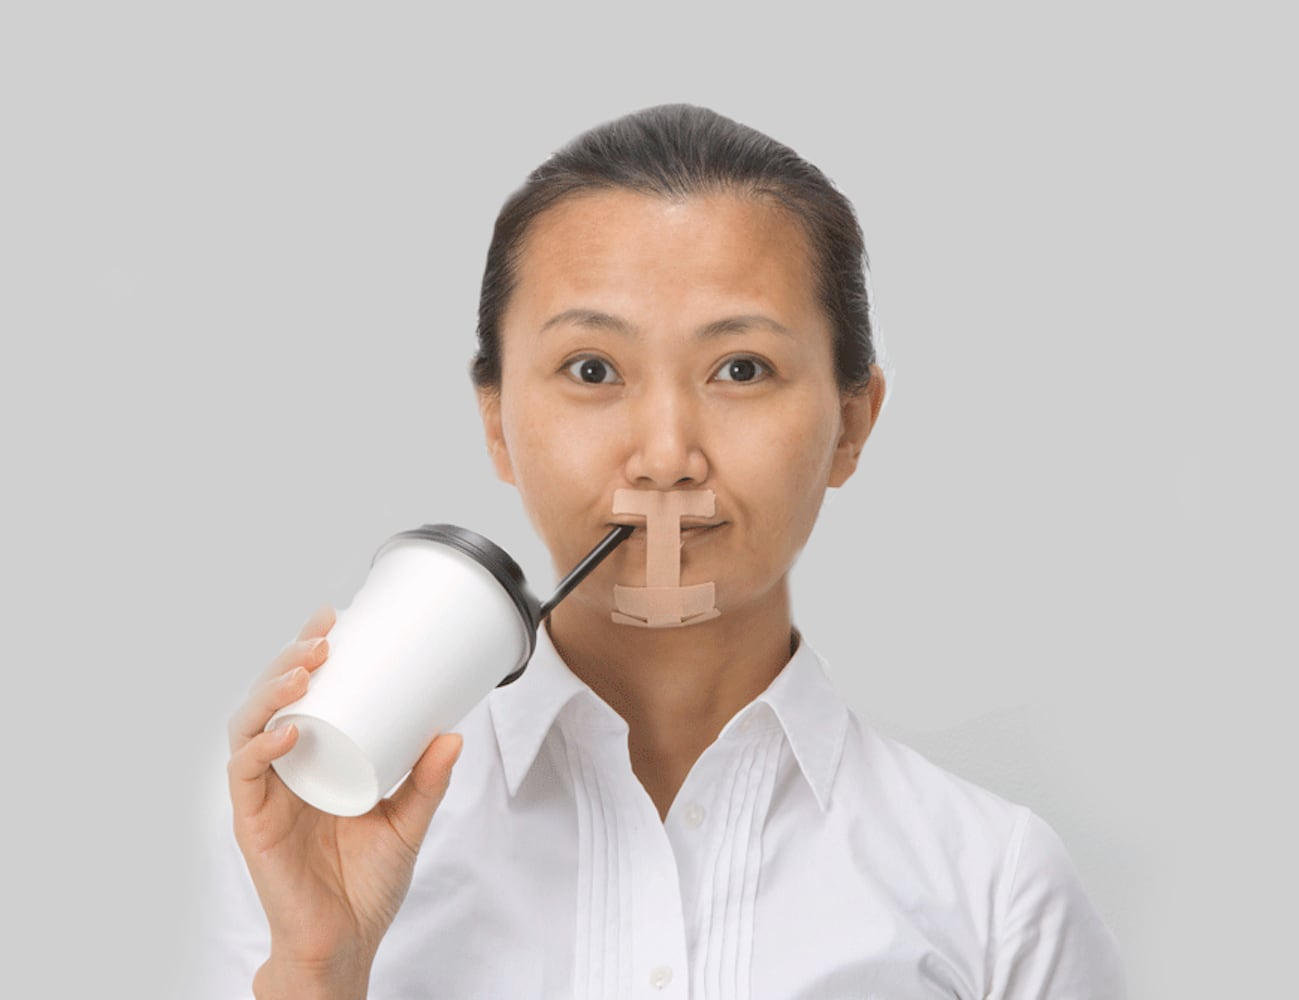 GODSUMM Nasal Breathing Strips prevent mouth breathing